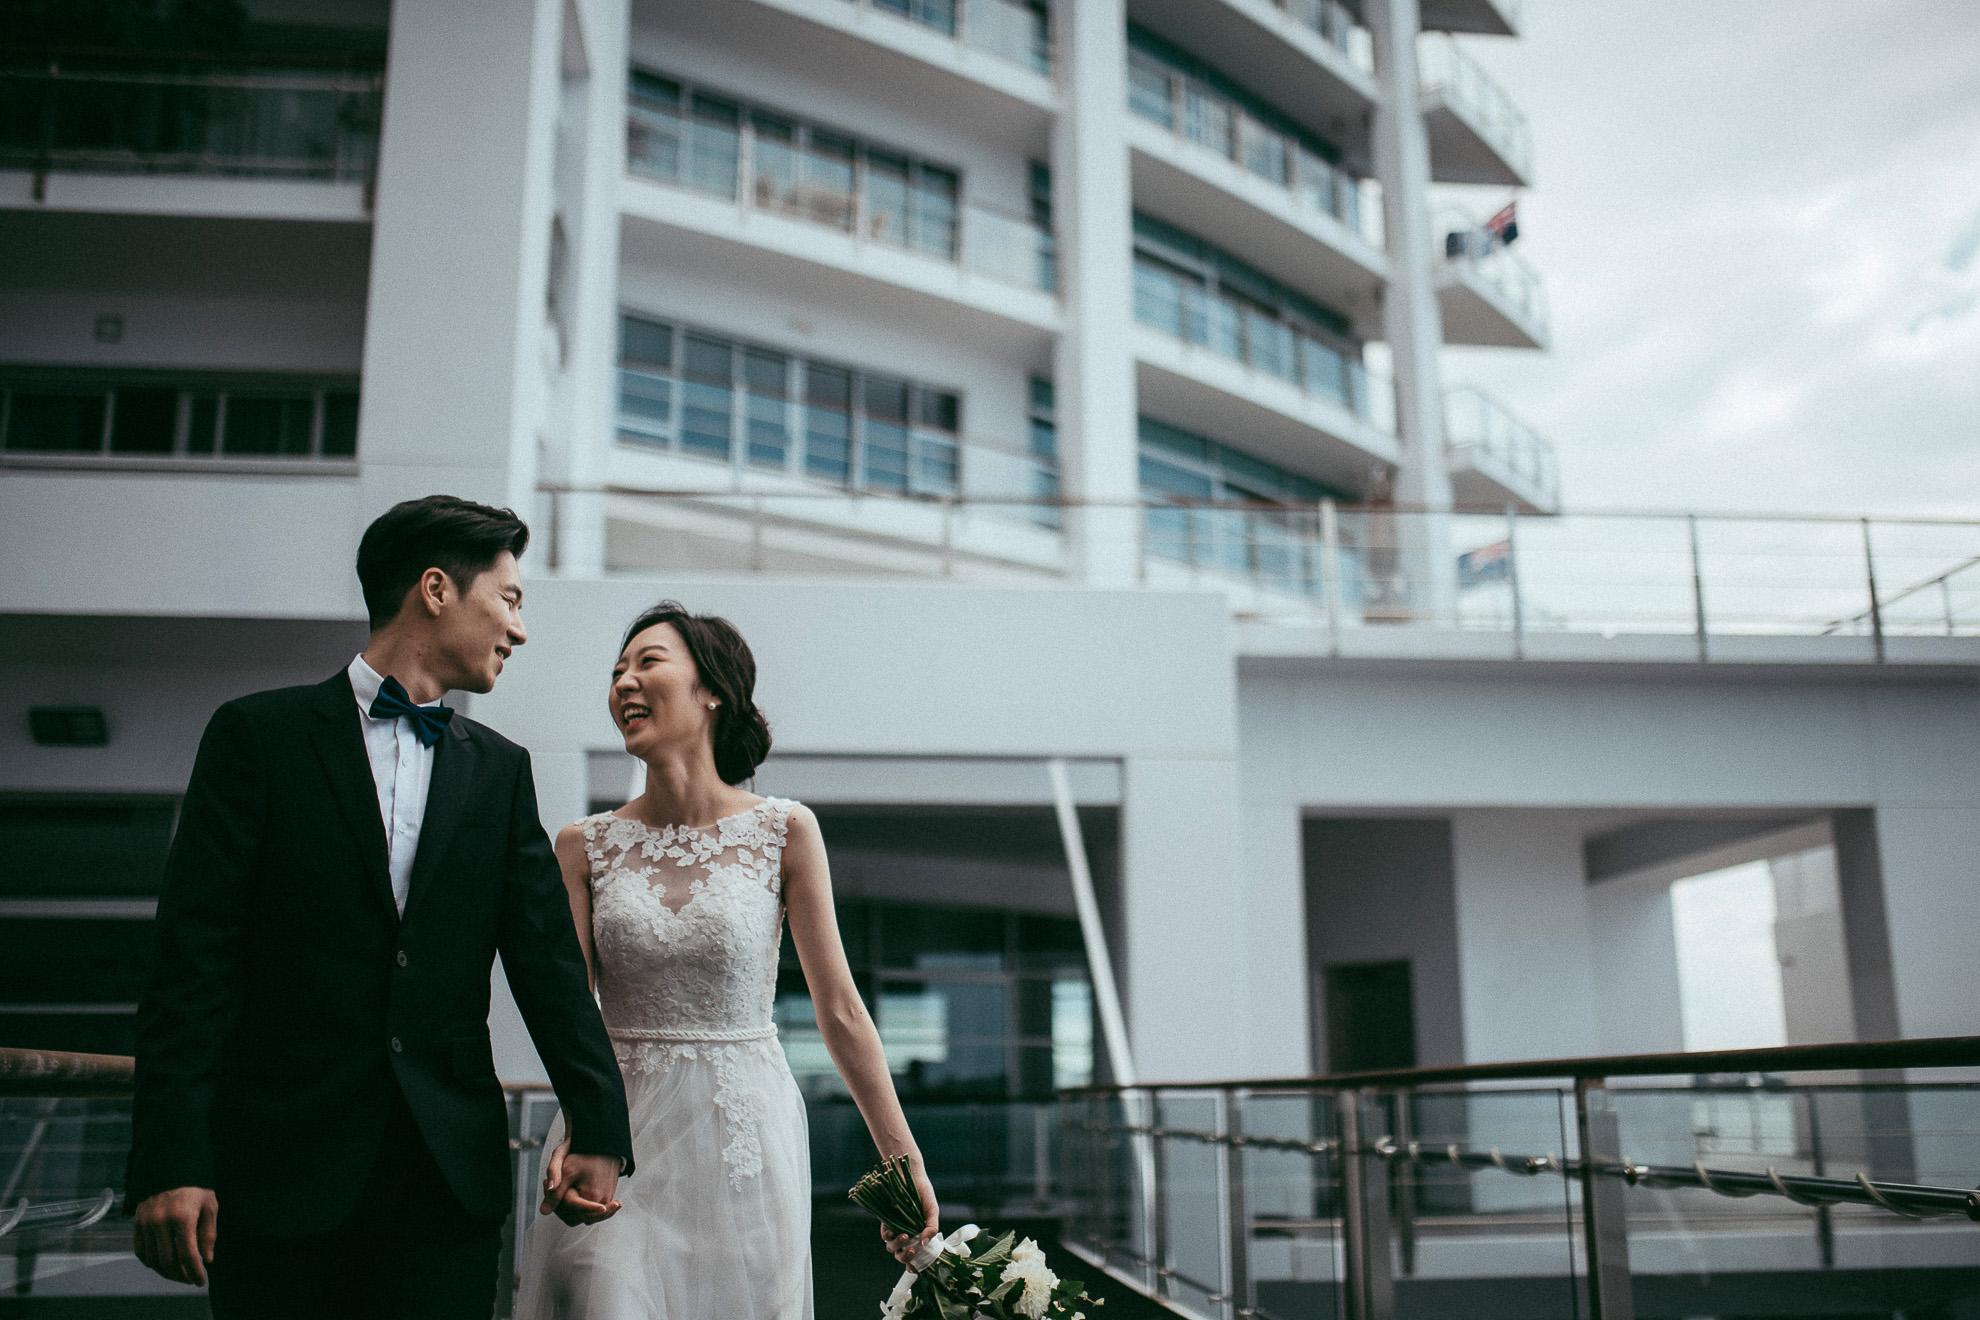 Hilton - Fish Restaurant wedding {Auckland City - New Zealand weddings photographer}